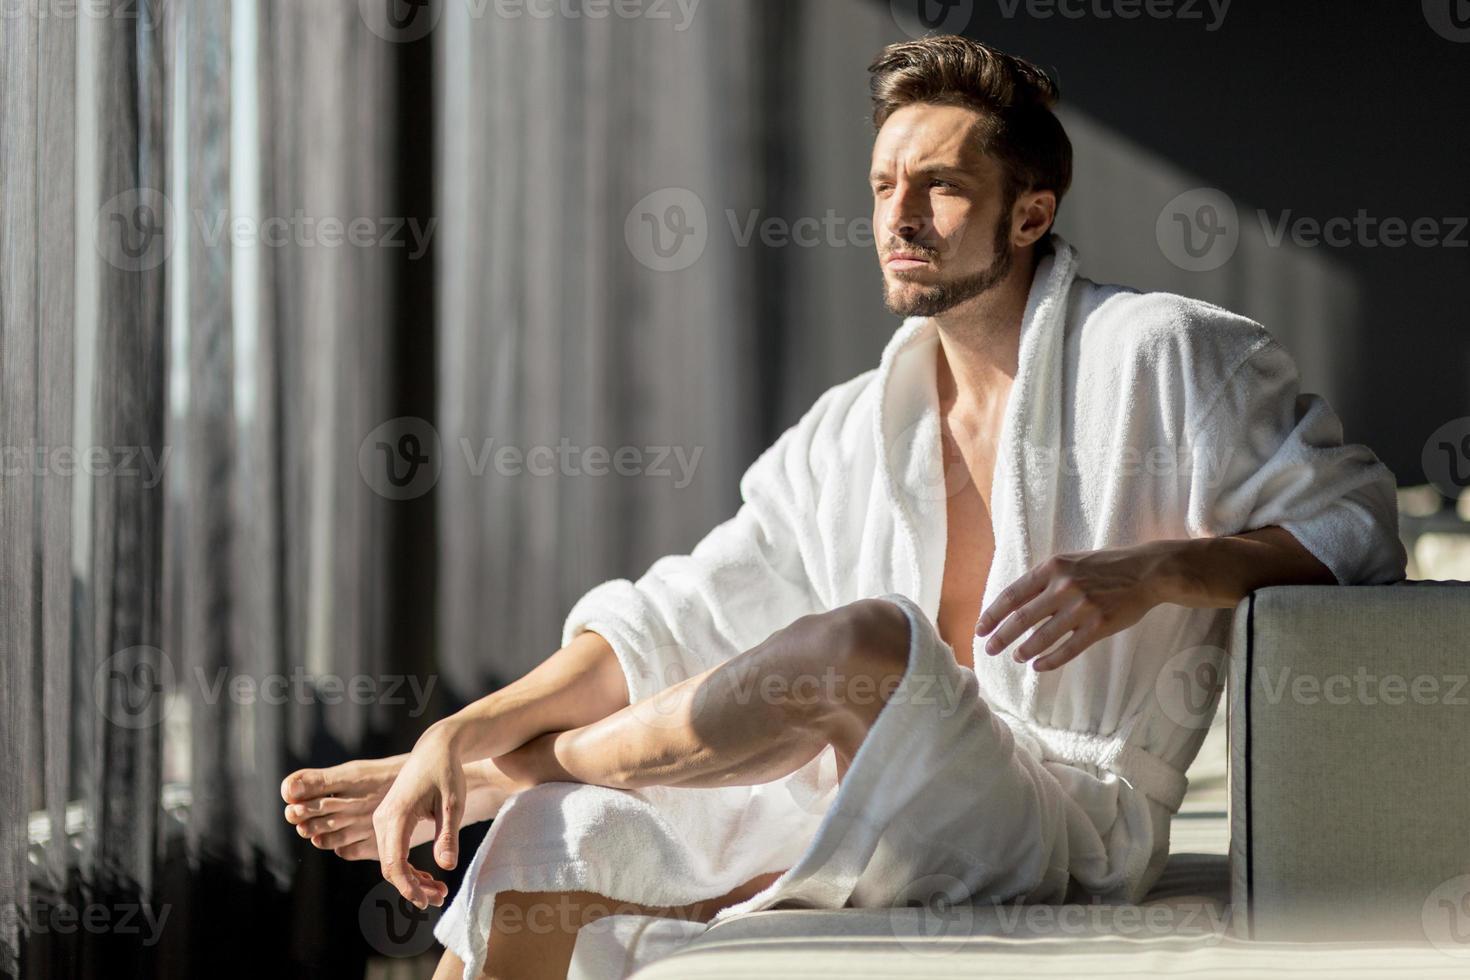 jonge man in de ochtend denken, zittend in een kamer foto